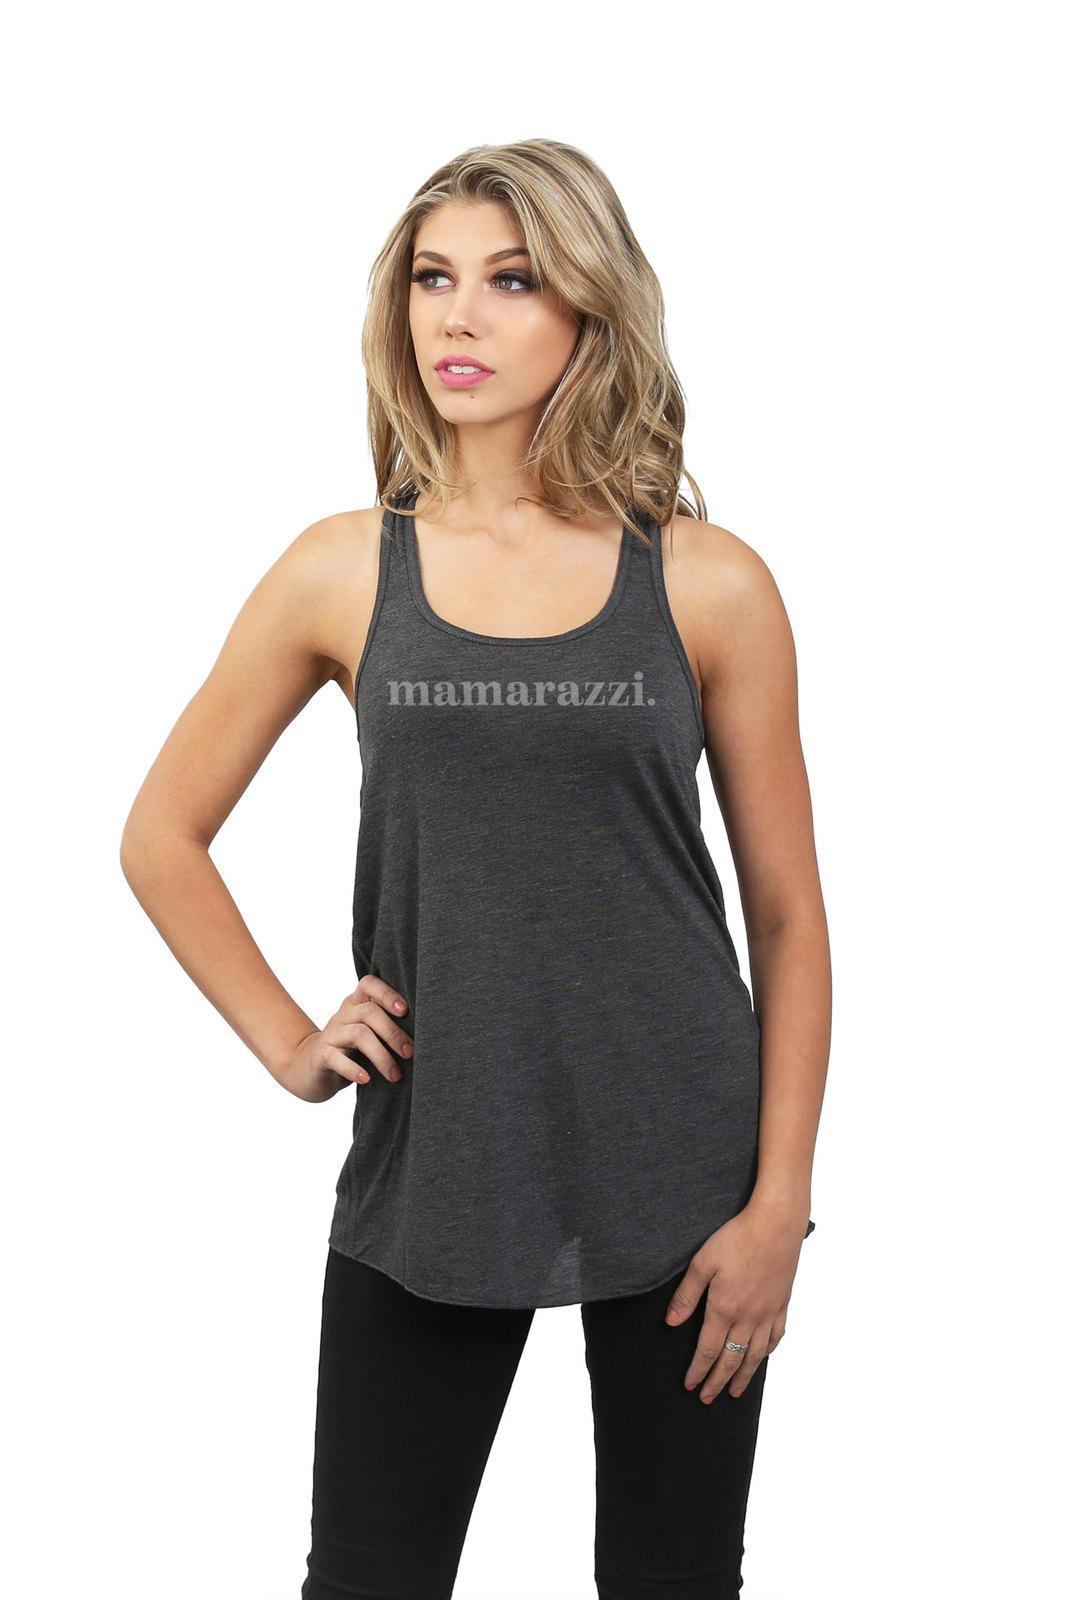 Thread Tank MamaRazzi Women's Sleeveless Flowy Racerback Tank Top Charcoal Grey